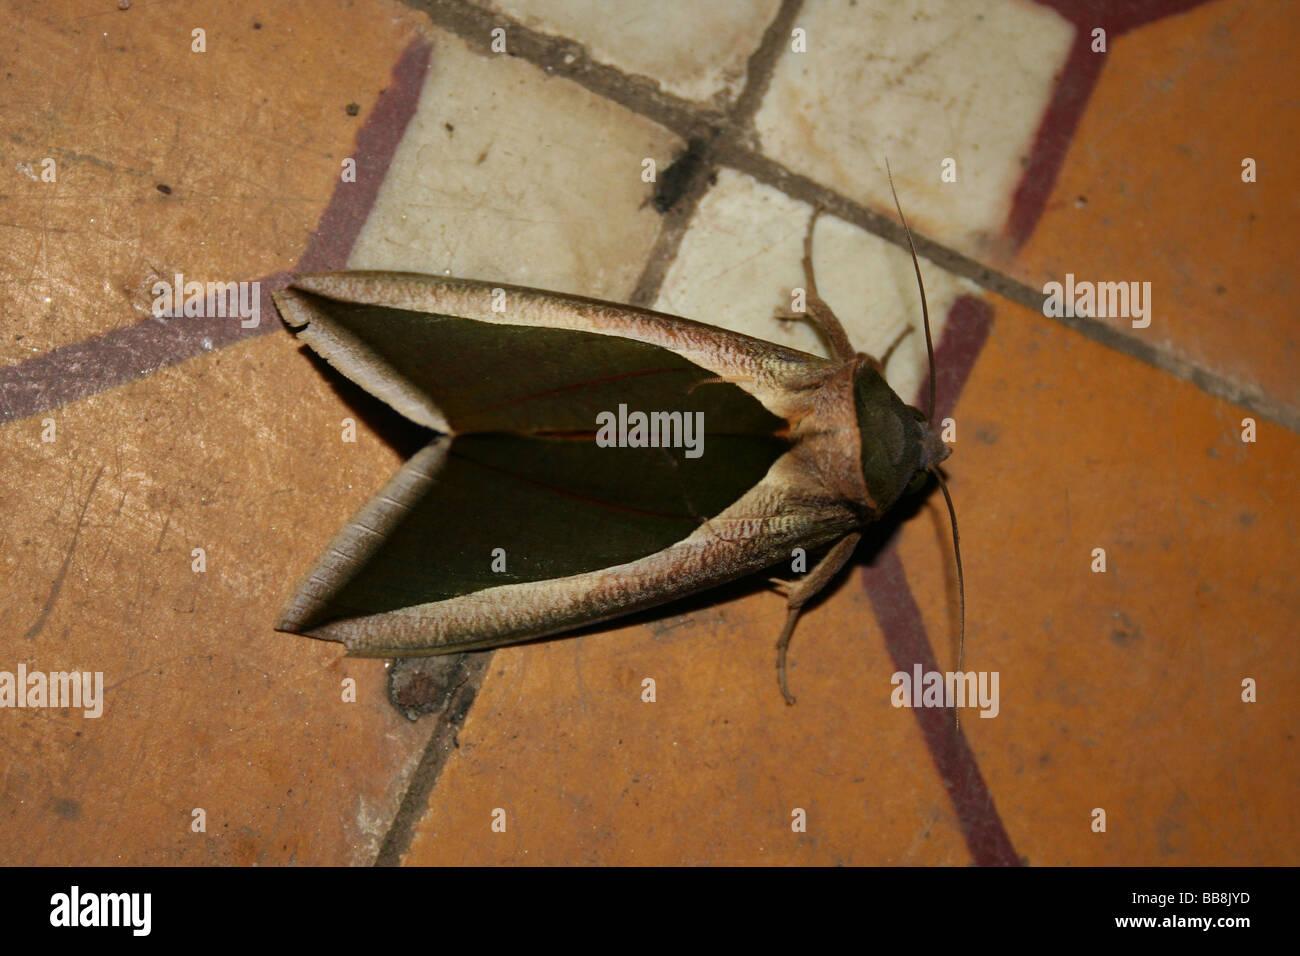 Moth, Viet Nam - Stock Image